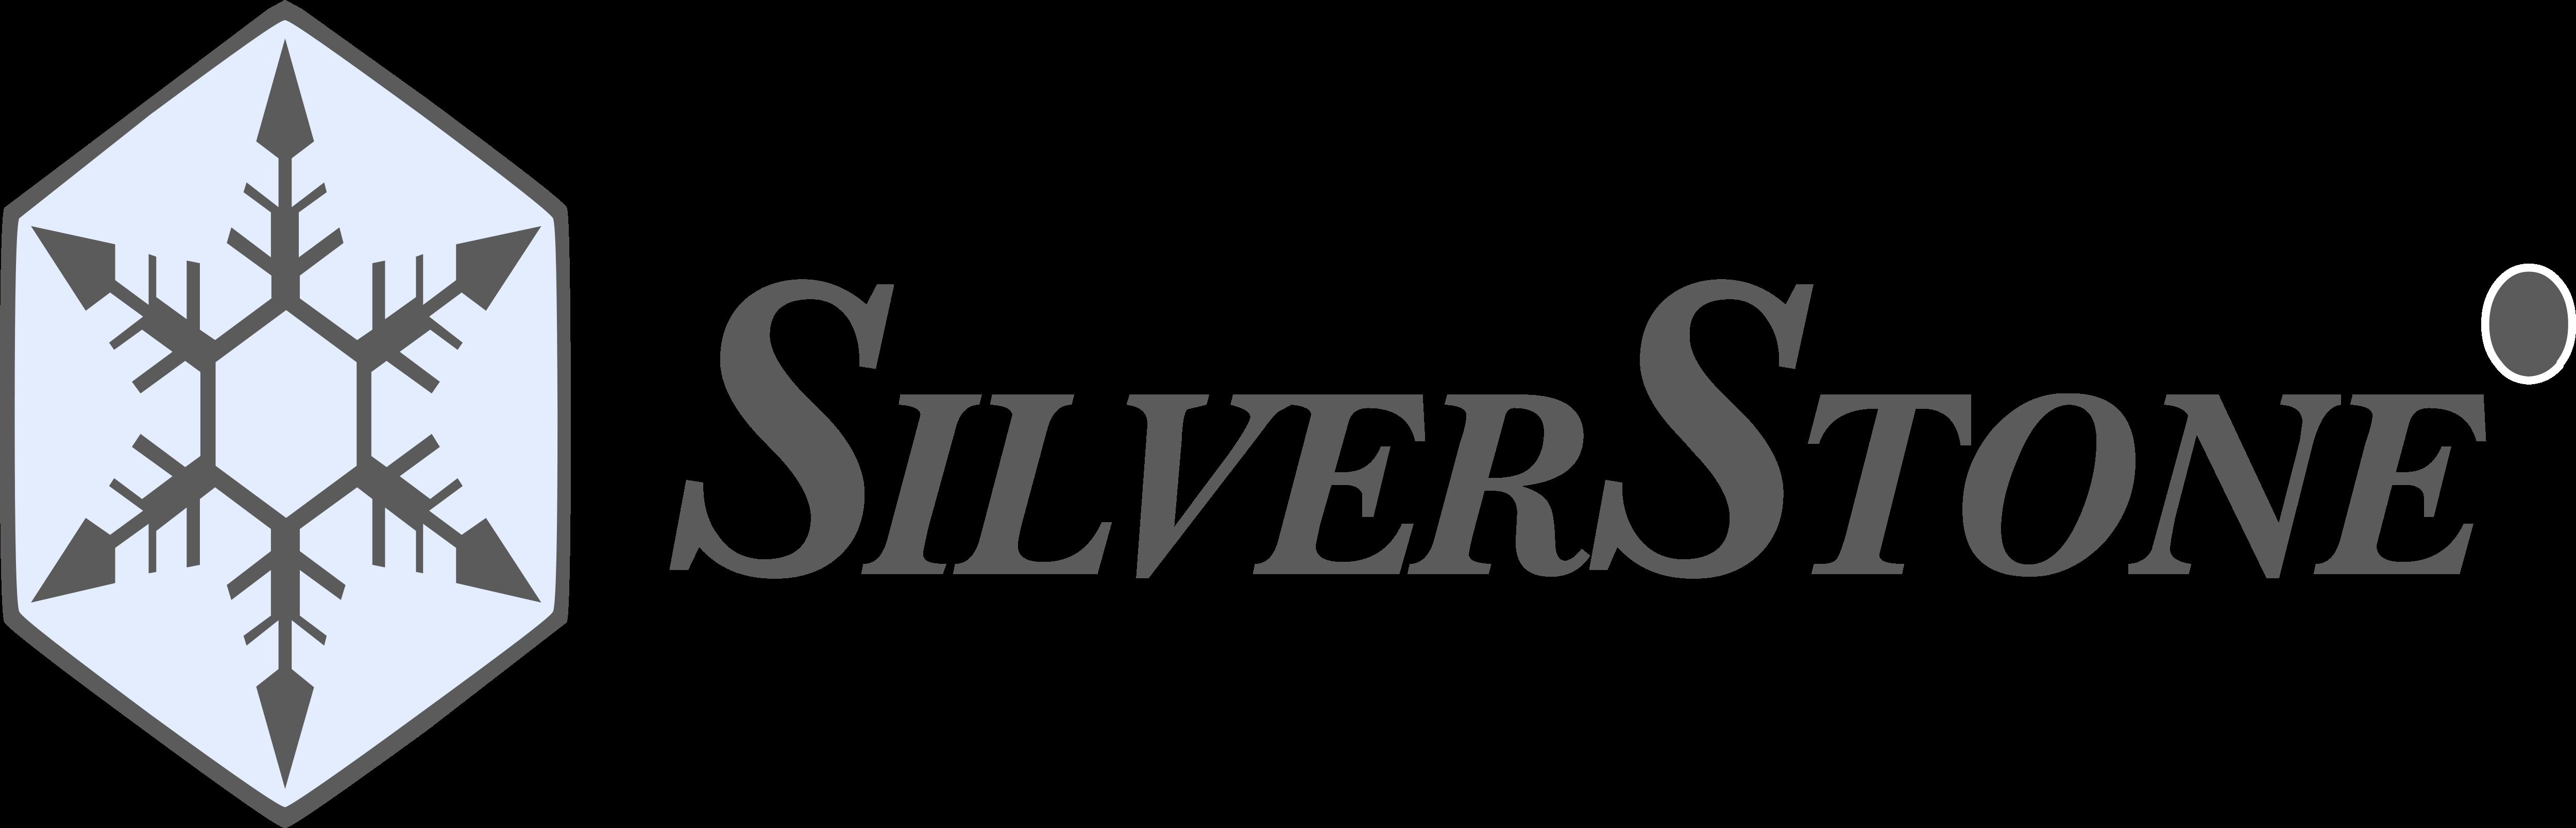 Silverstone®